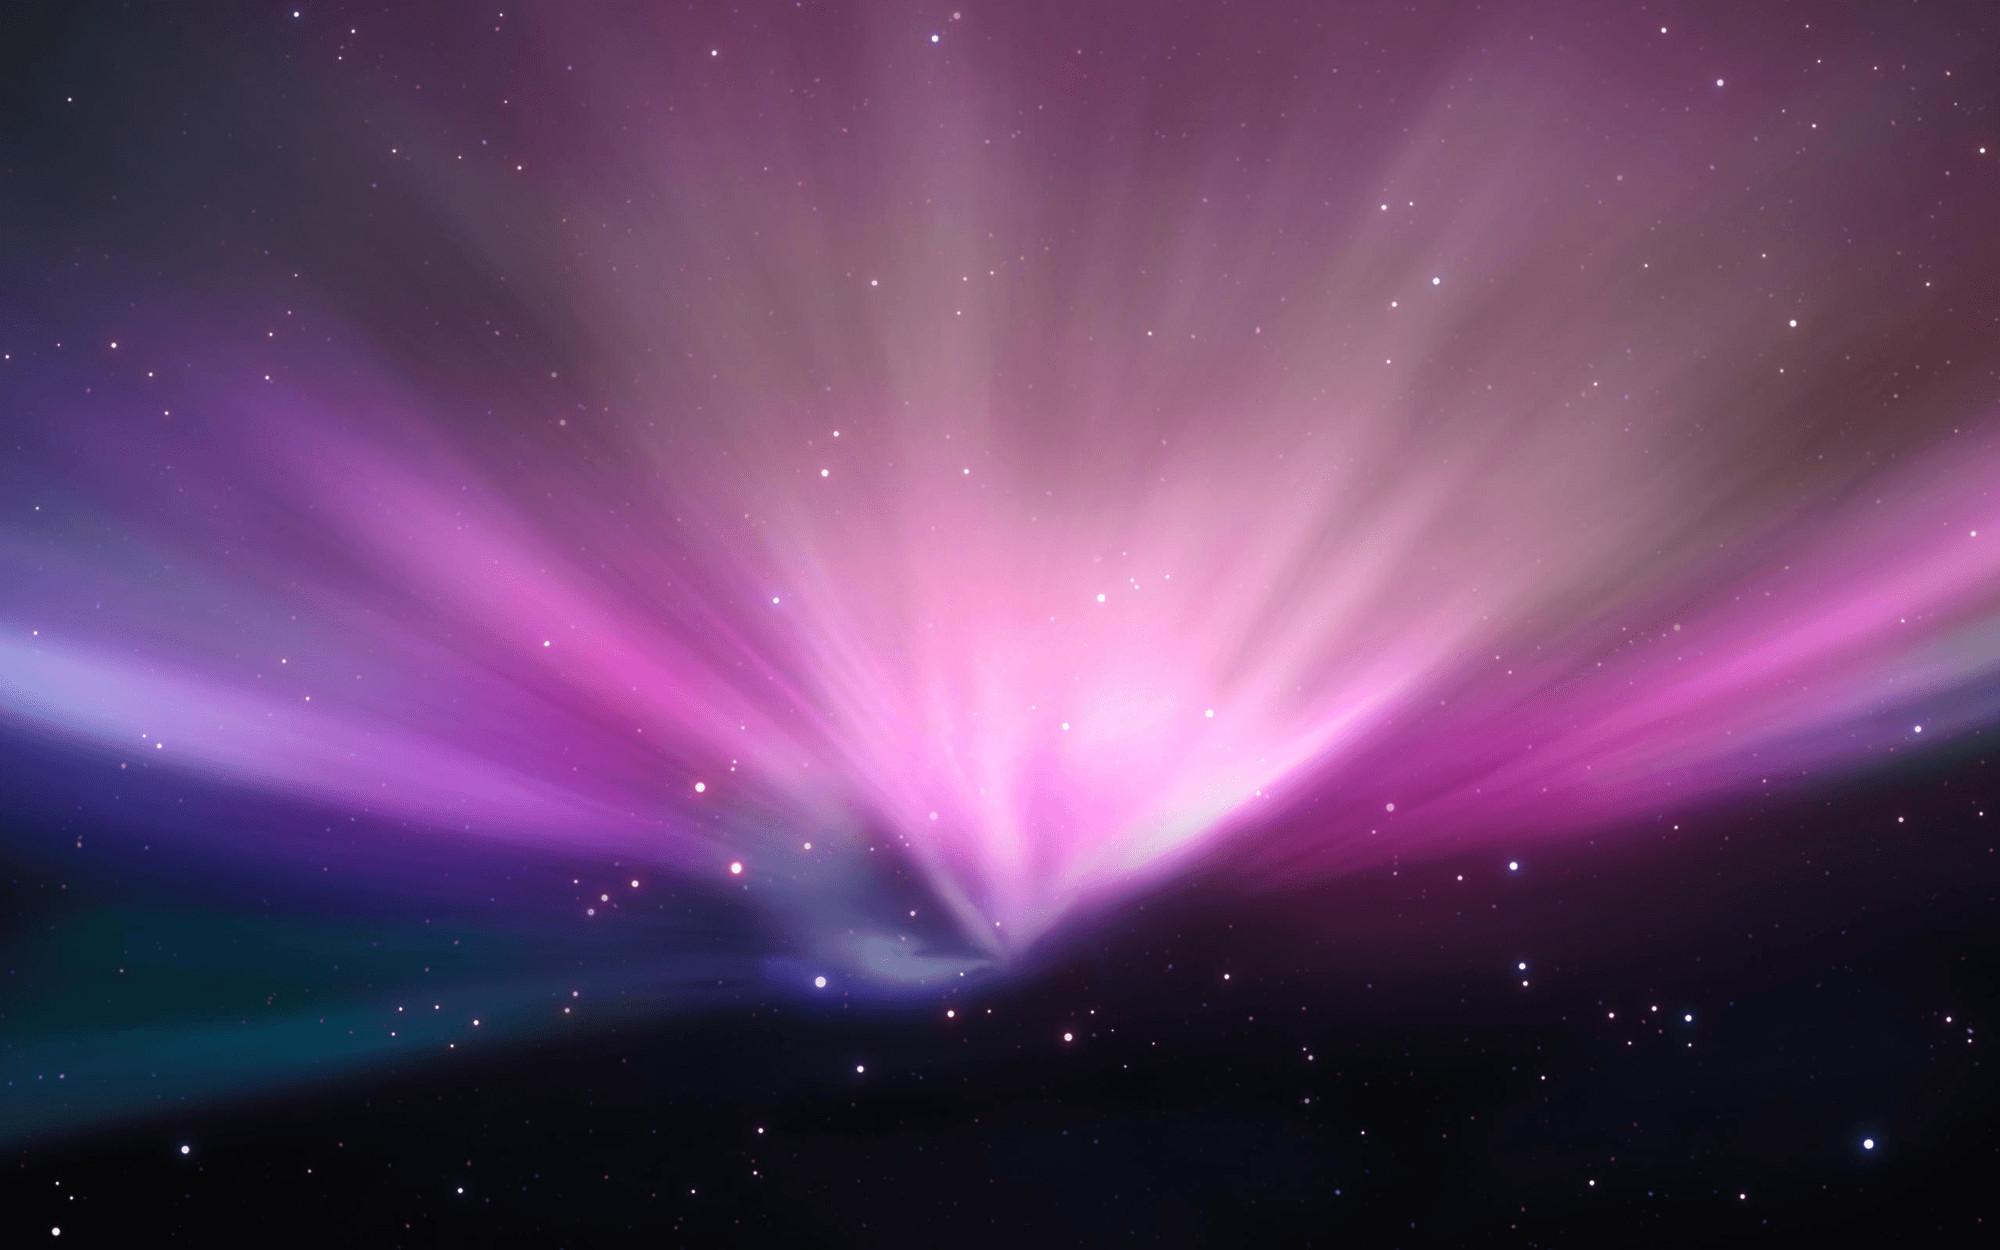 Image - Galaxy Desktop Wallpaper Mac , HD Wallpaper & Backgrounds